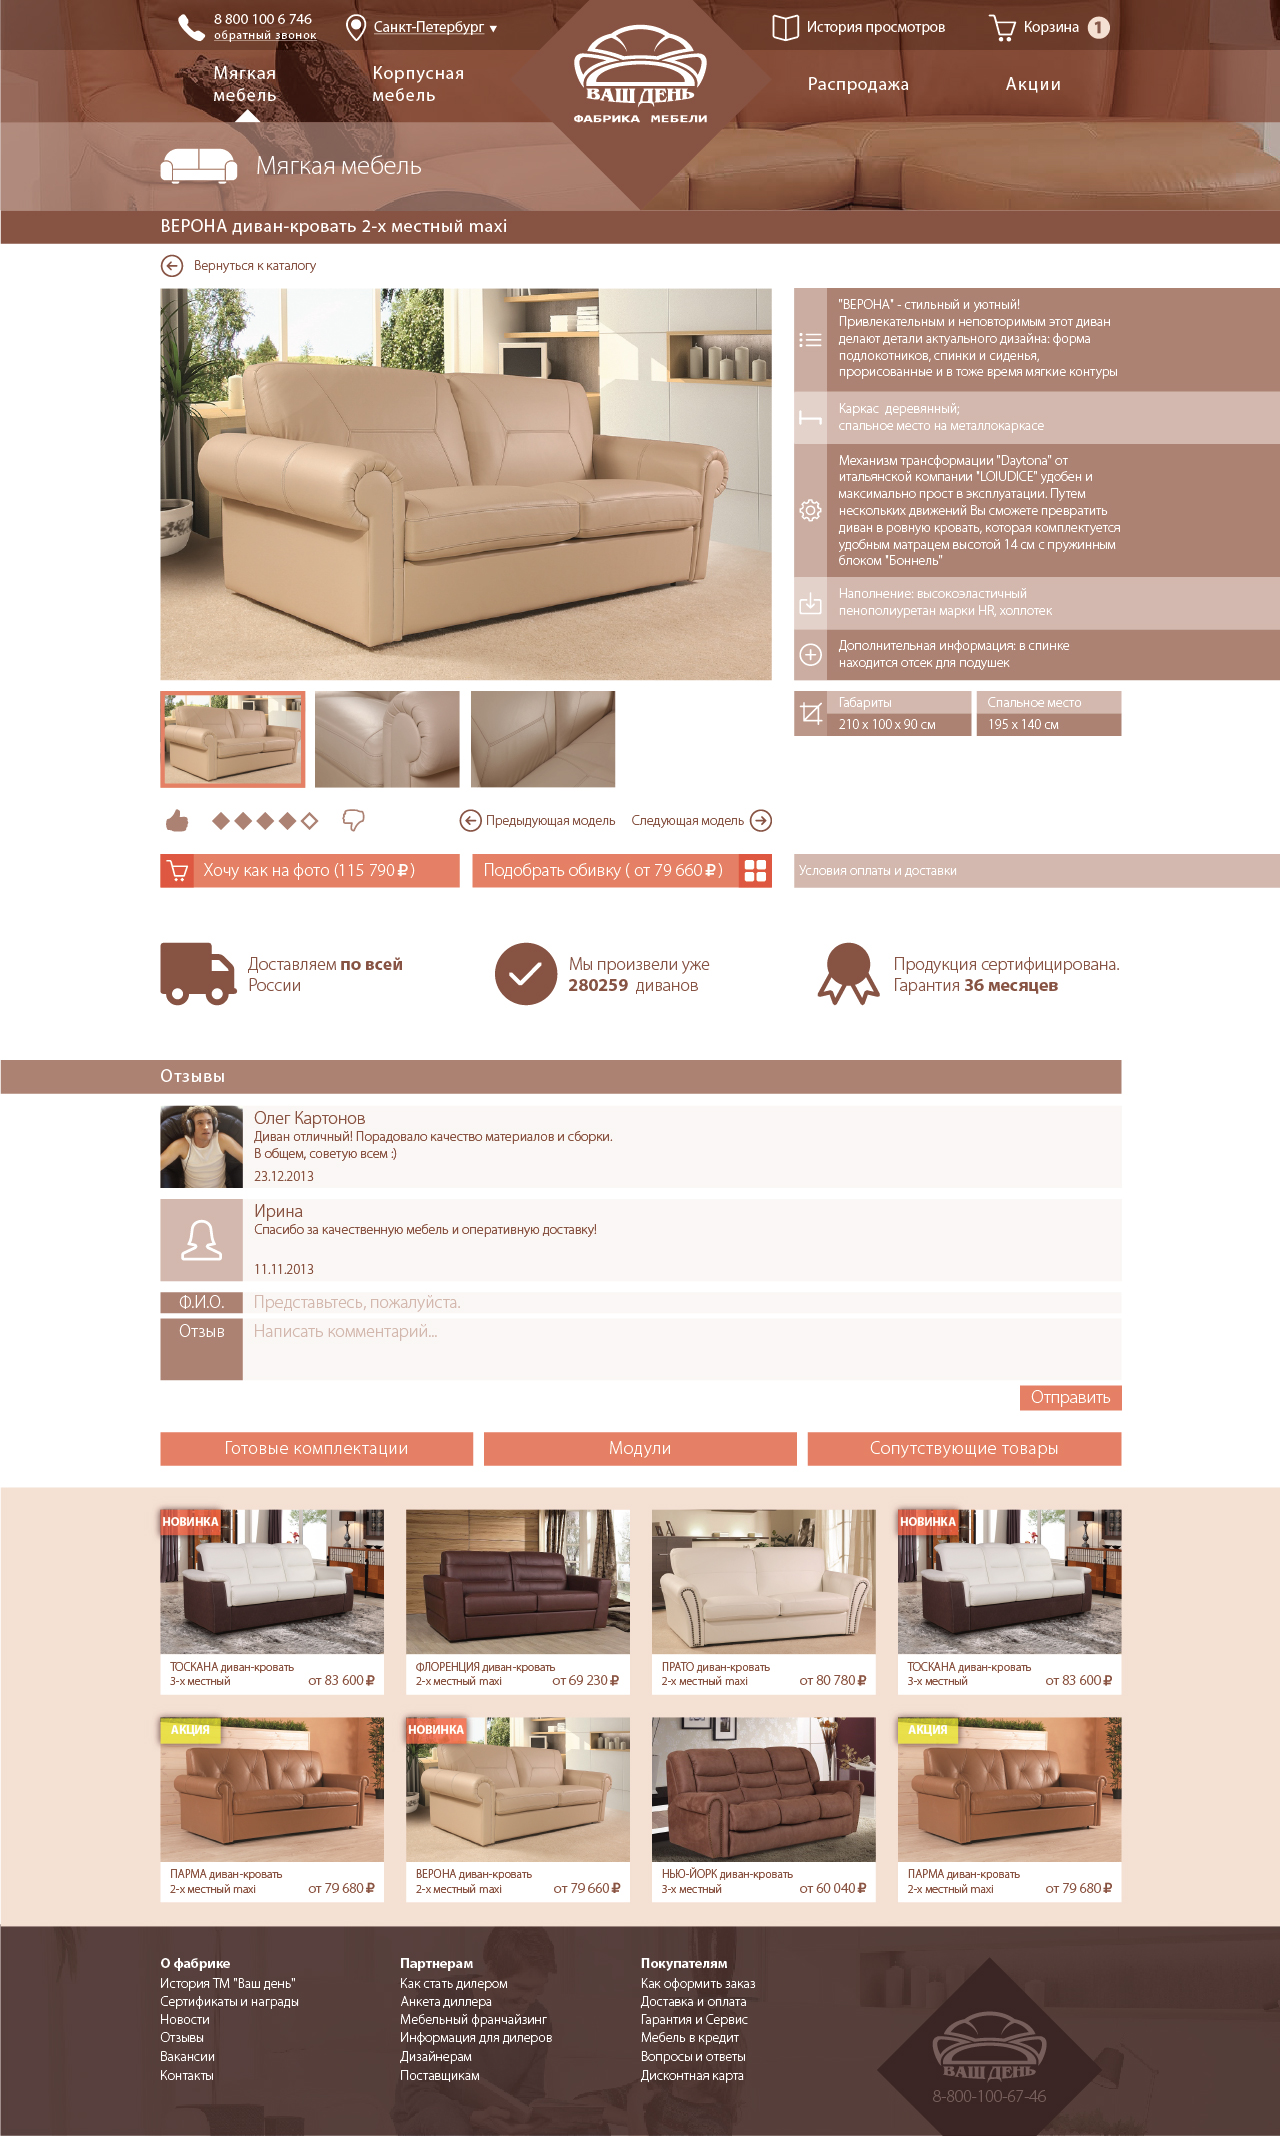 Разработать дизайн для интернет-магазина мебели фото f_32152efd4aa0c62a.jpg